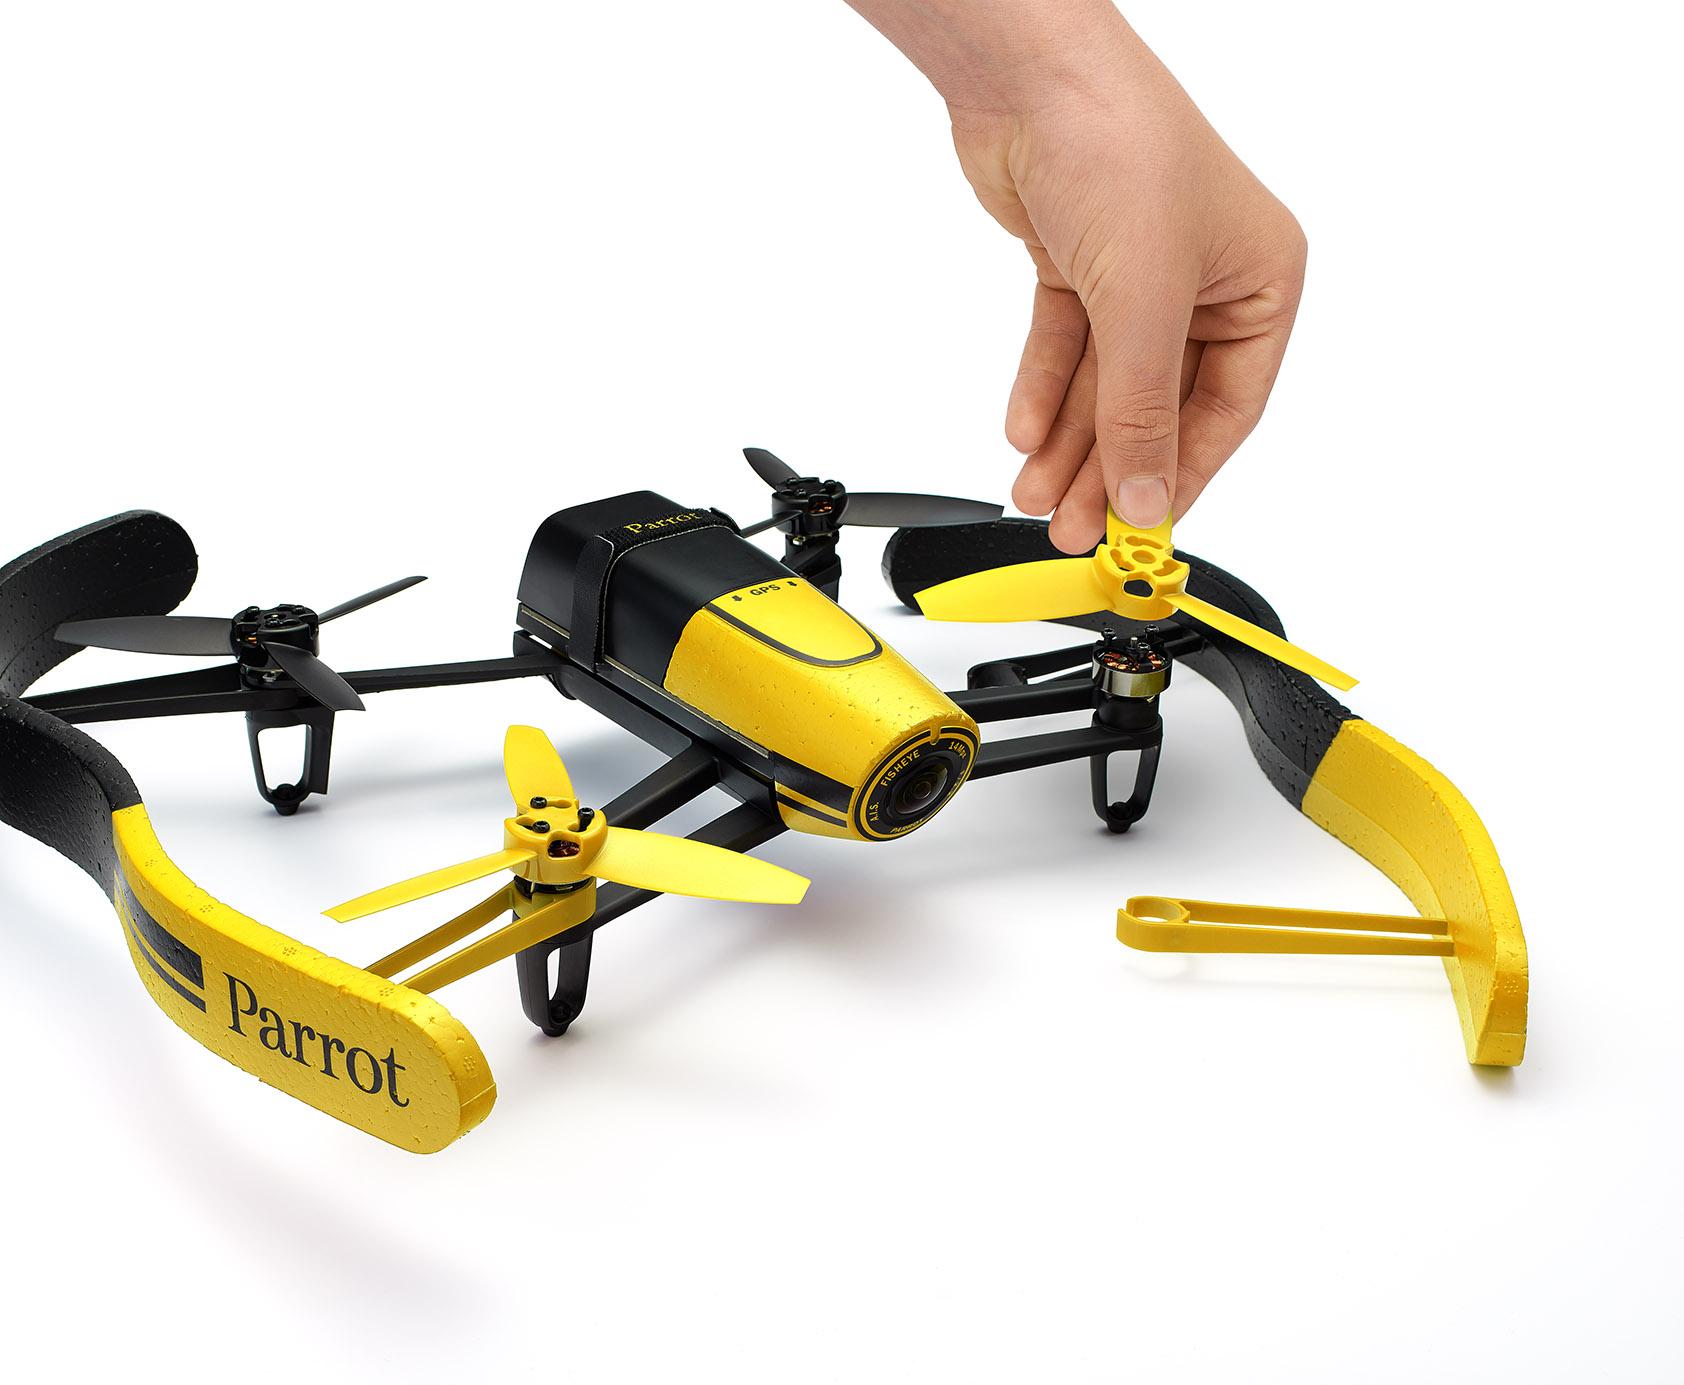 parrot-bebop-drone-new-11.jpg